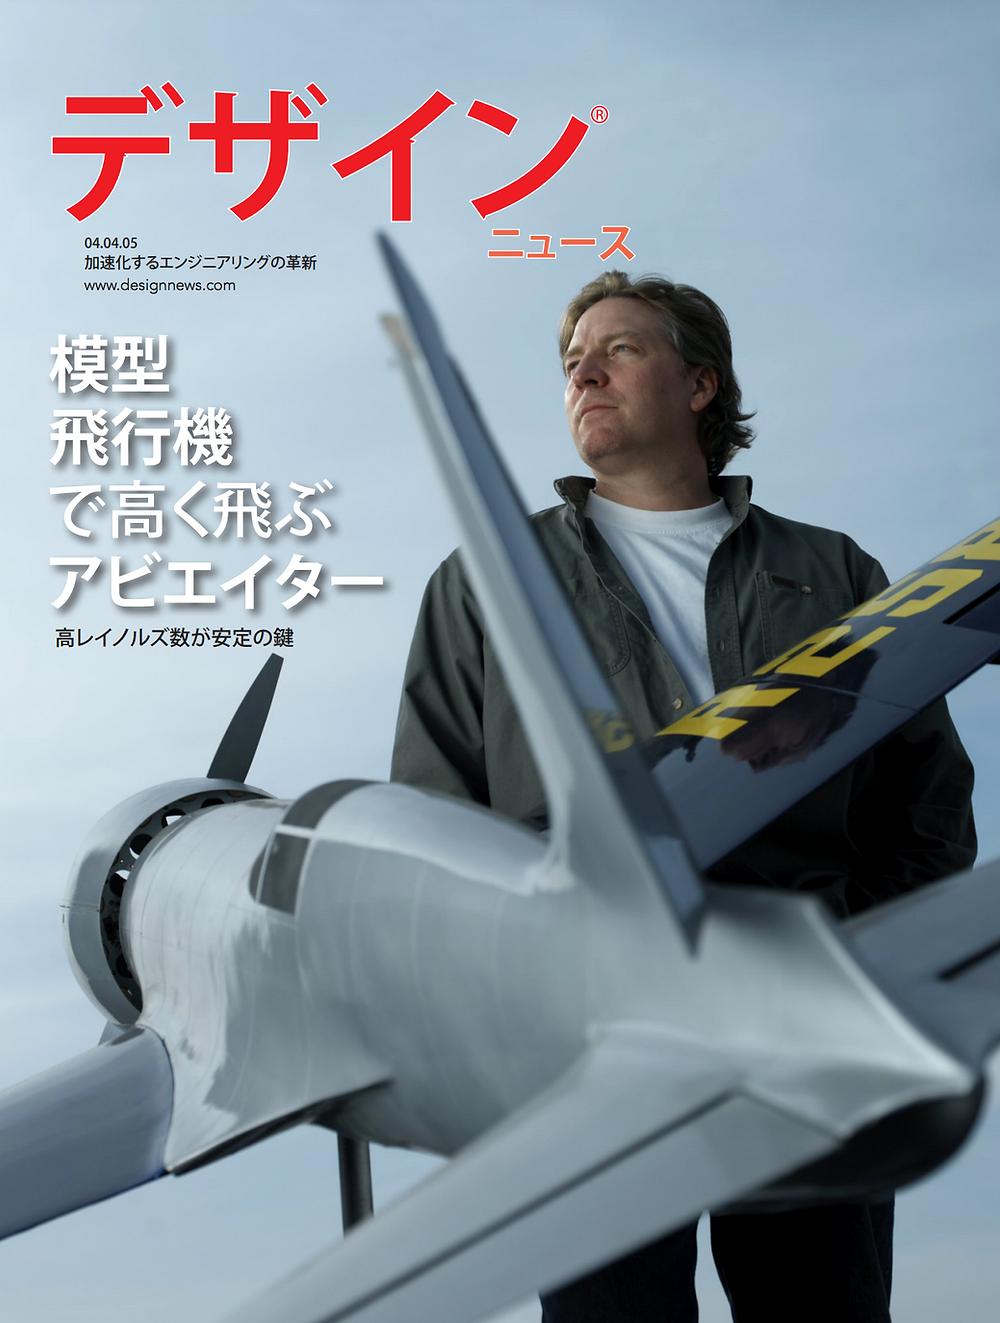 Press: Design News Japan